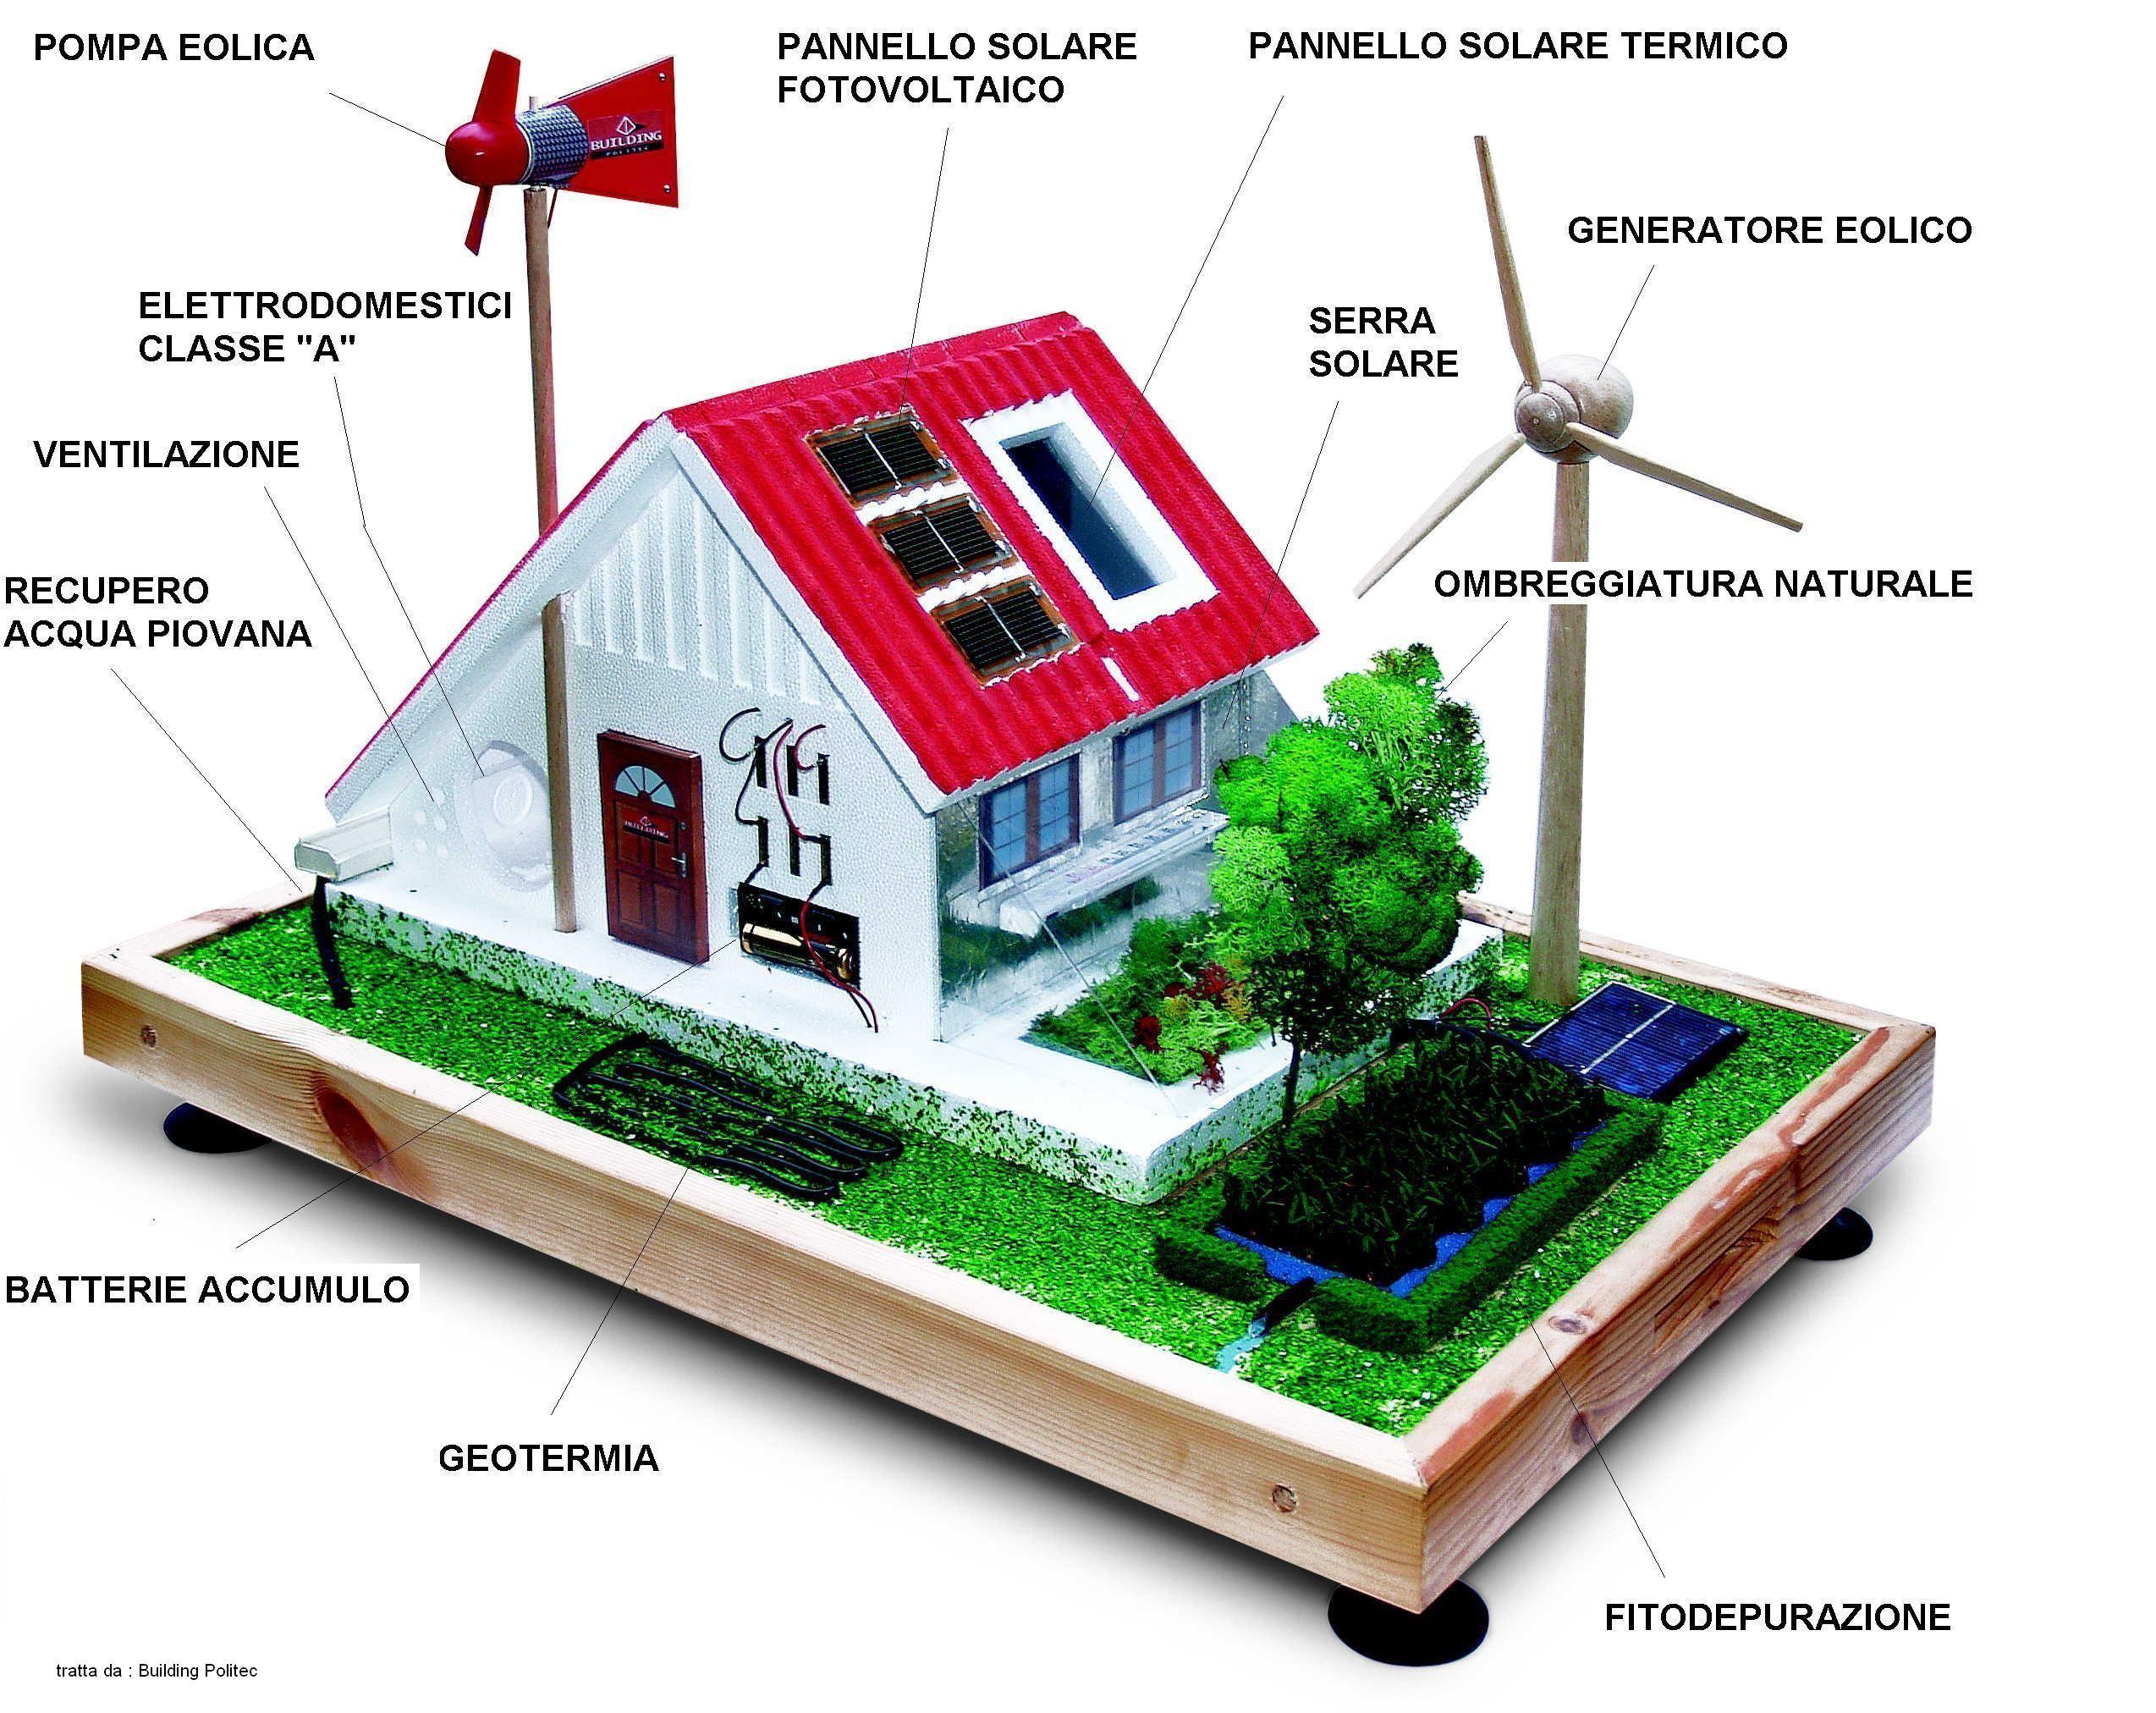 Permacultura Casas Ecologicas Buscar Con Google Casas Ecologicas Casas Autosustentables Casas Sostenibles